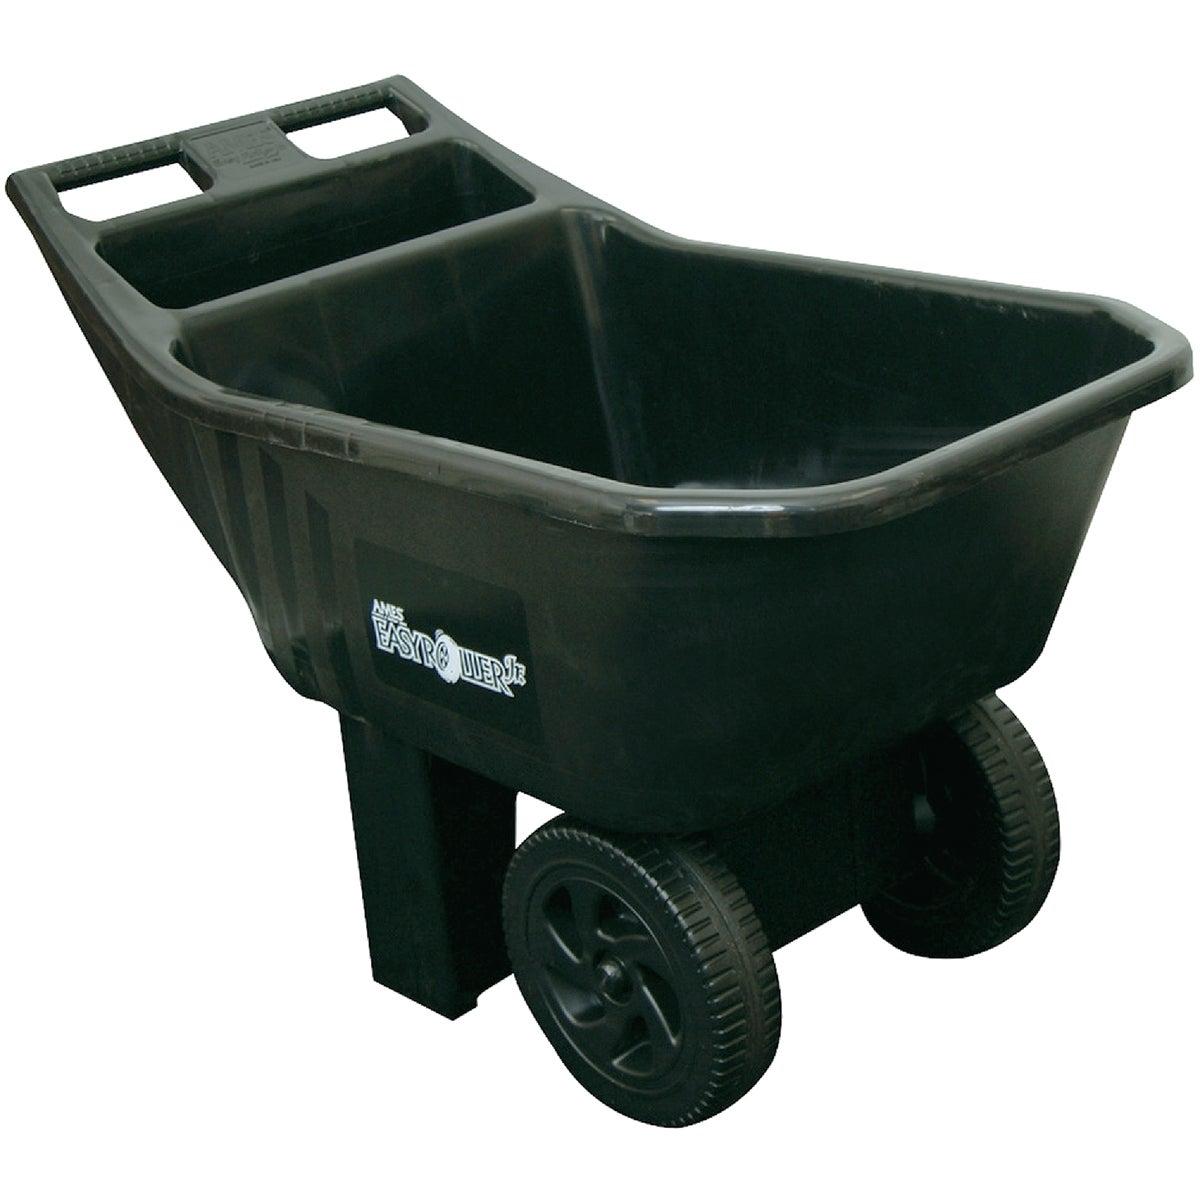 Ames Easy Roller Jr. Lawn Garden Cart, 2463675